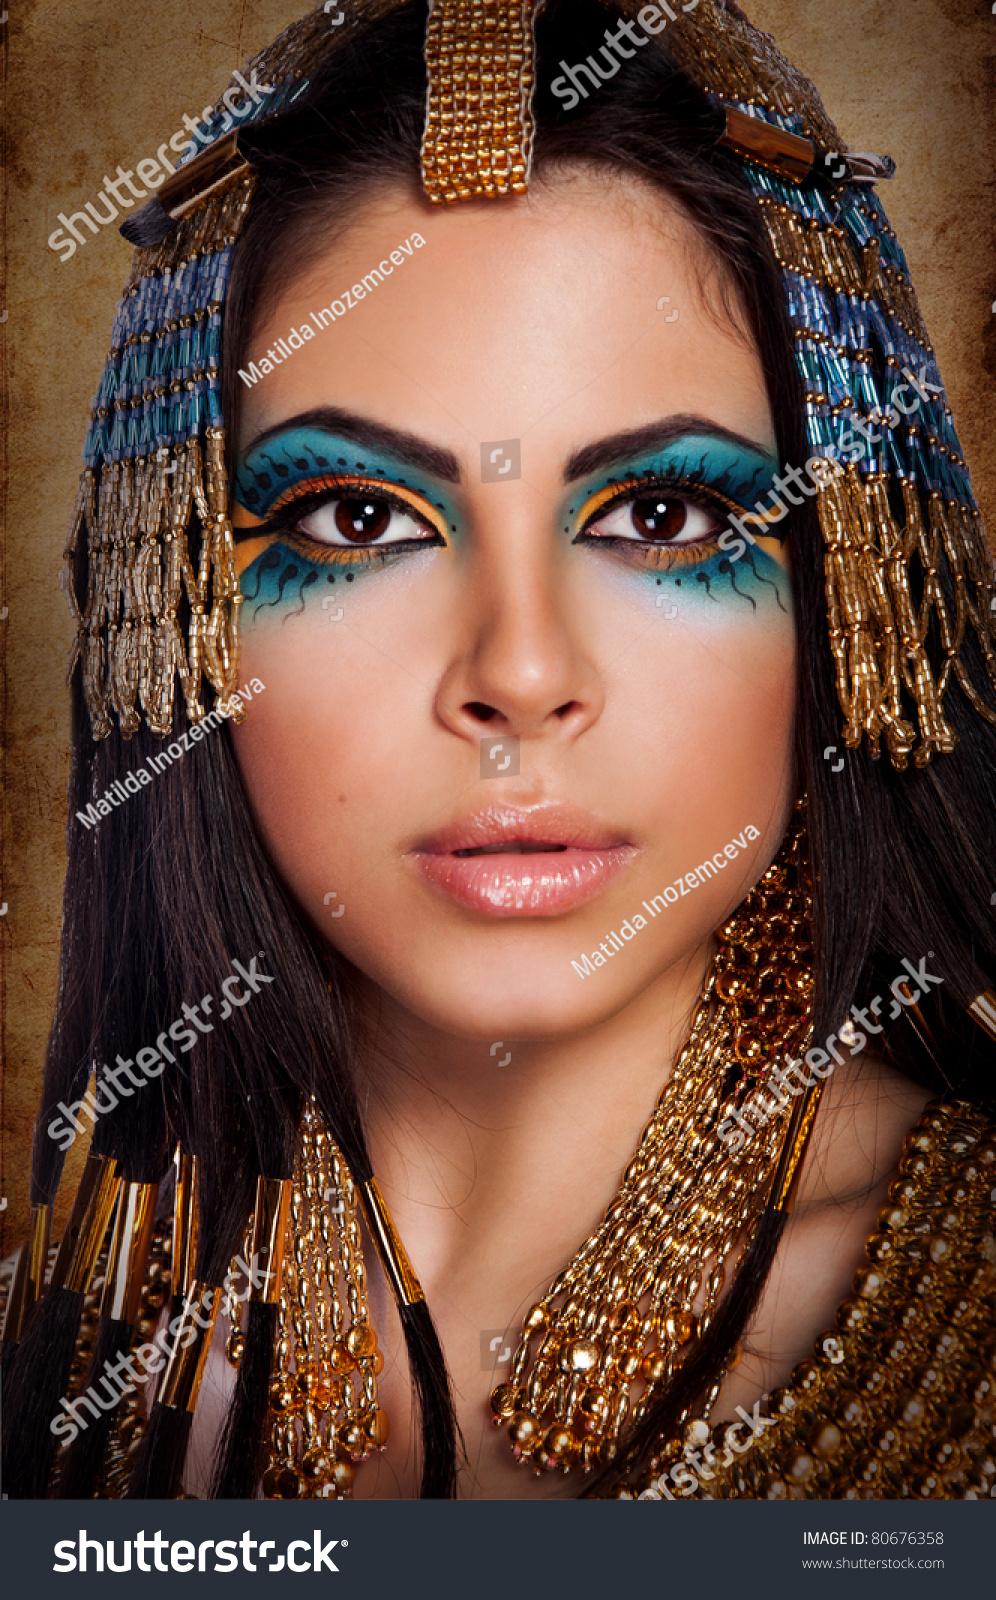 fkk cleopatra hebe senk einlauf